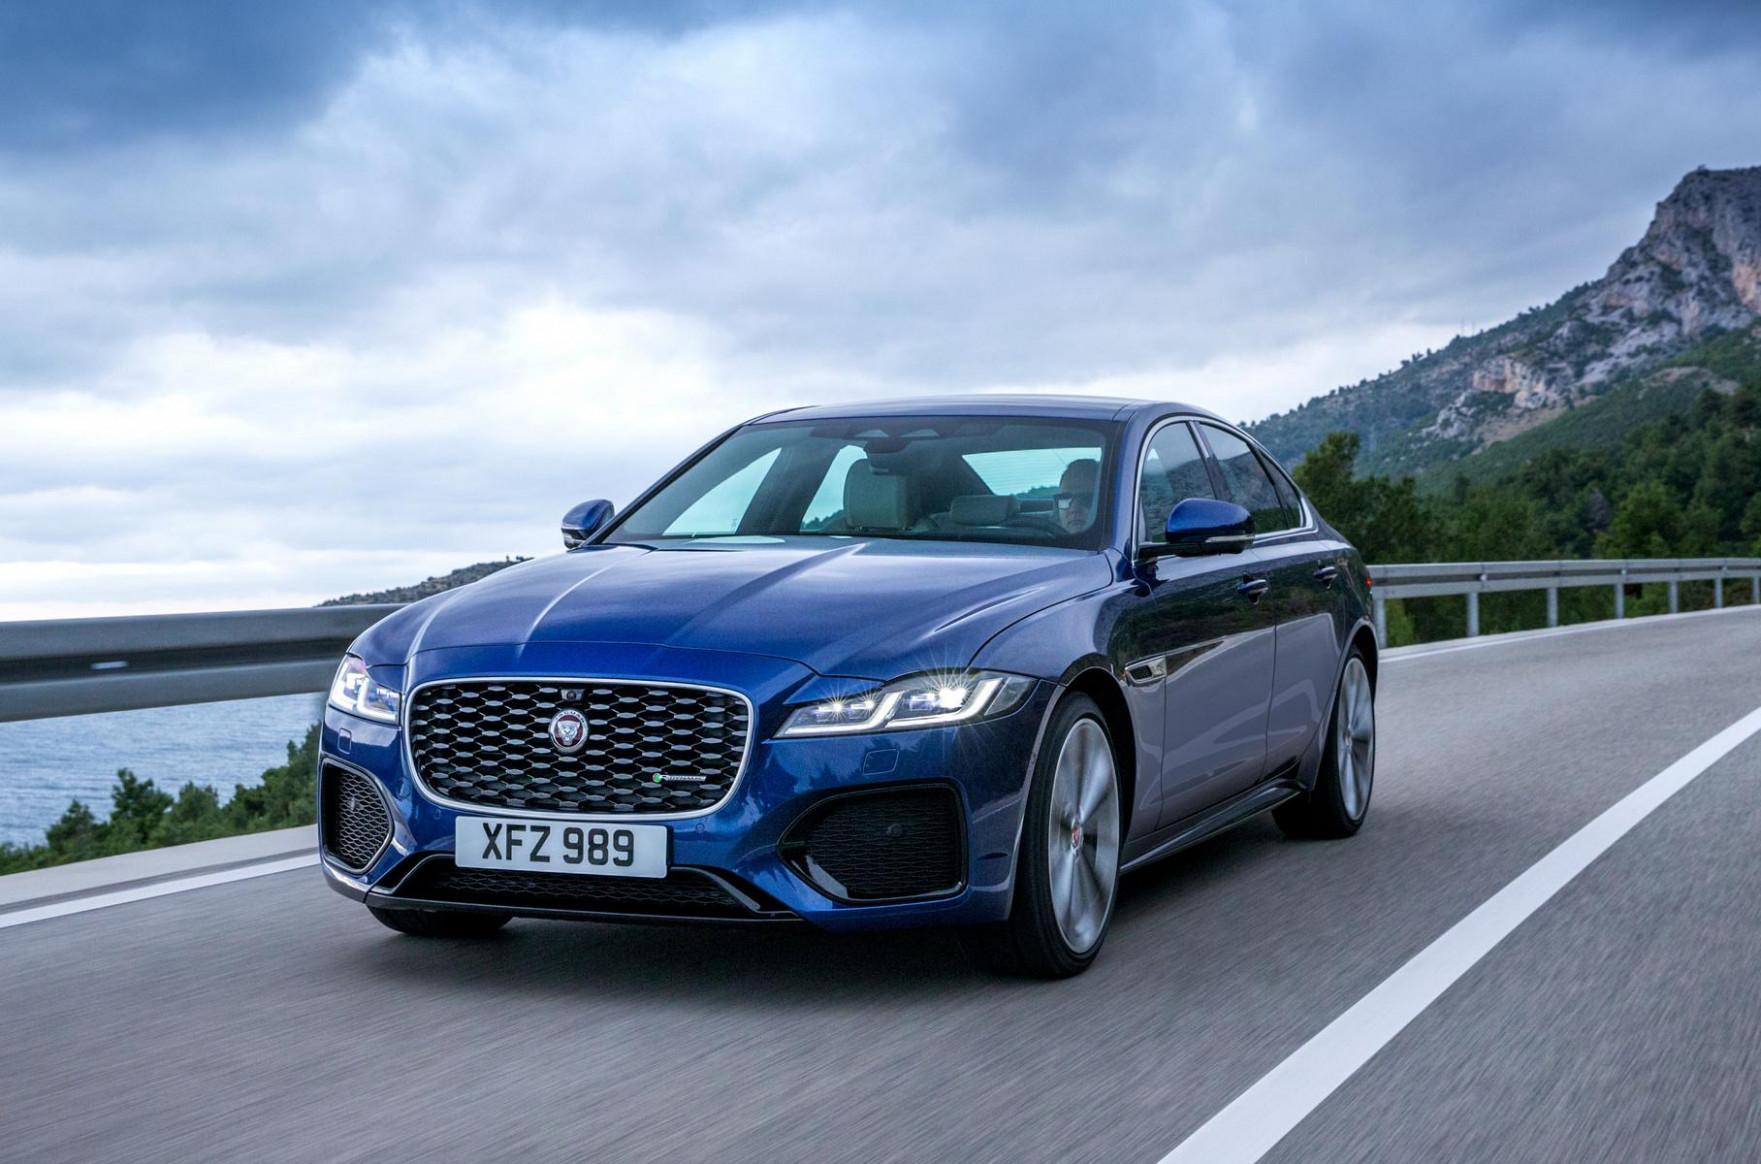 Review 2022 Jaguar XE